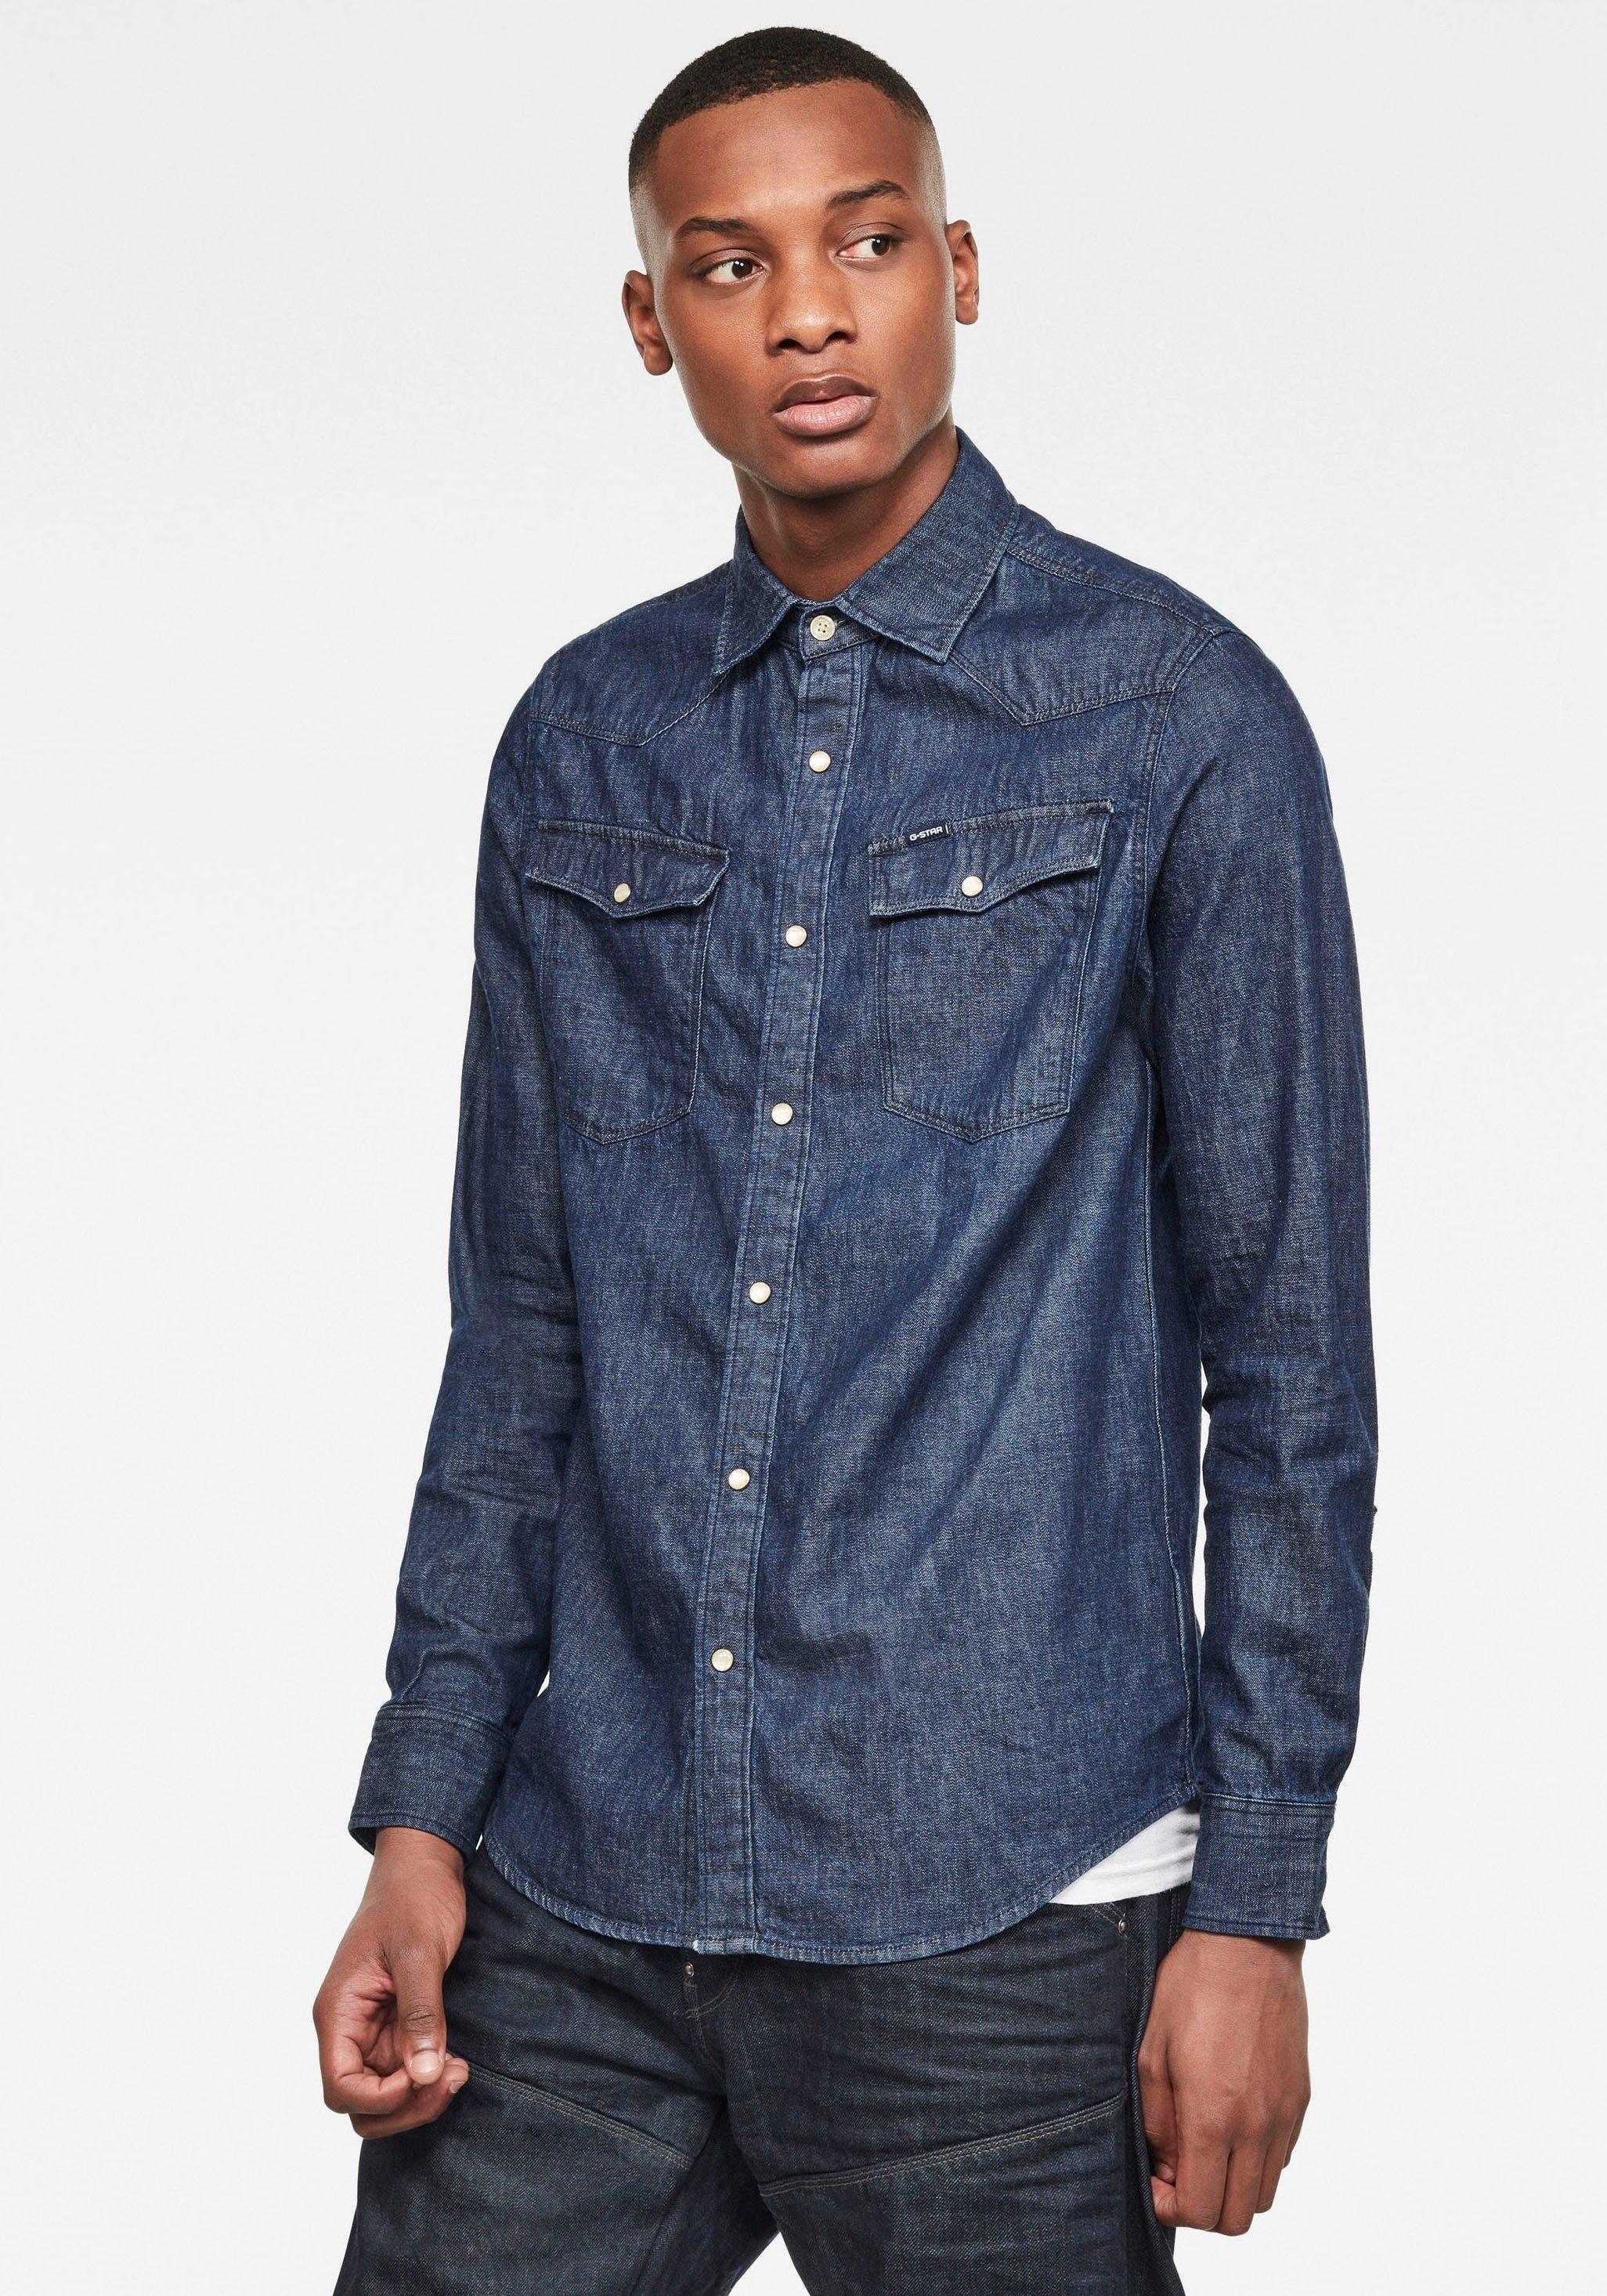 G-Star Raw jeansoverhemd voordelig en veilig online kopen